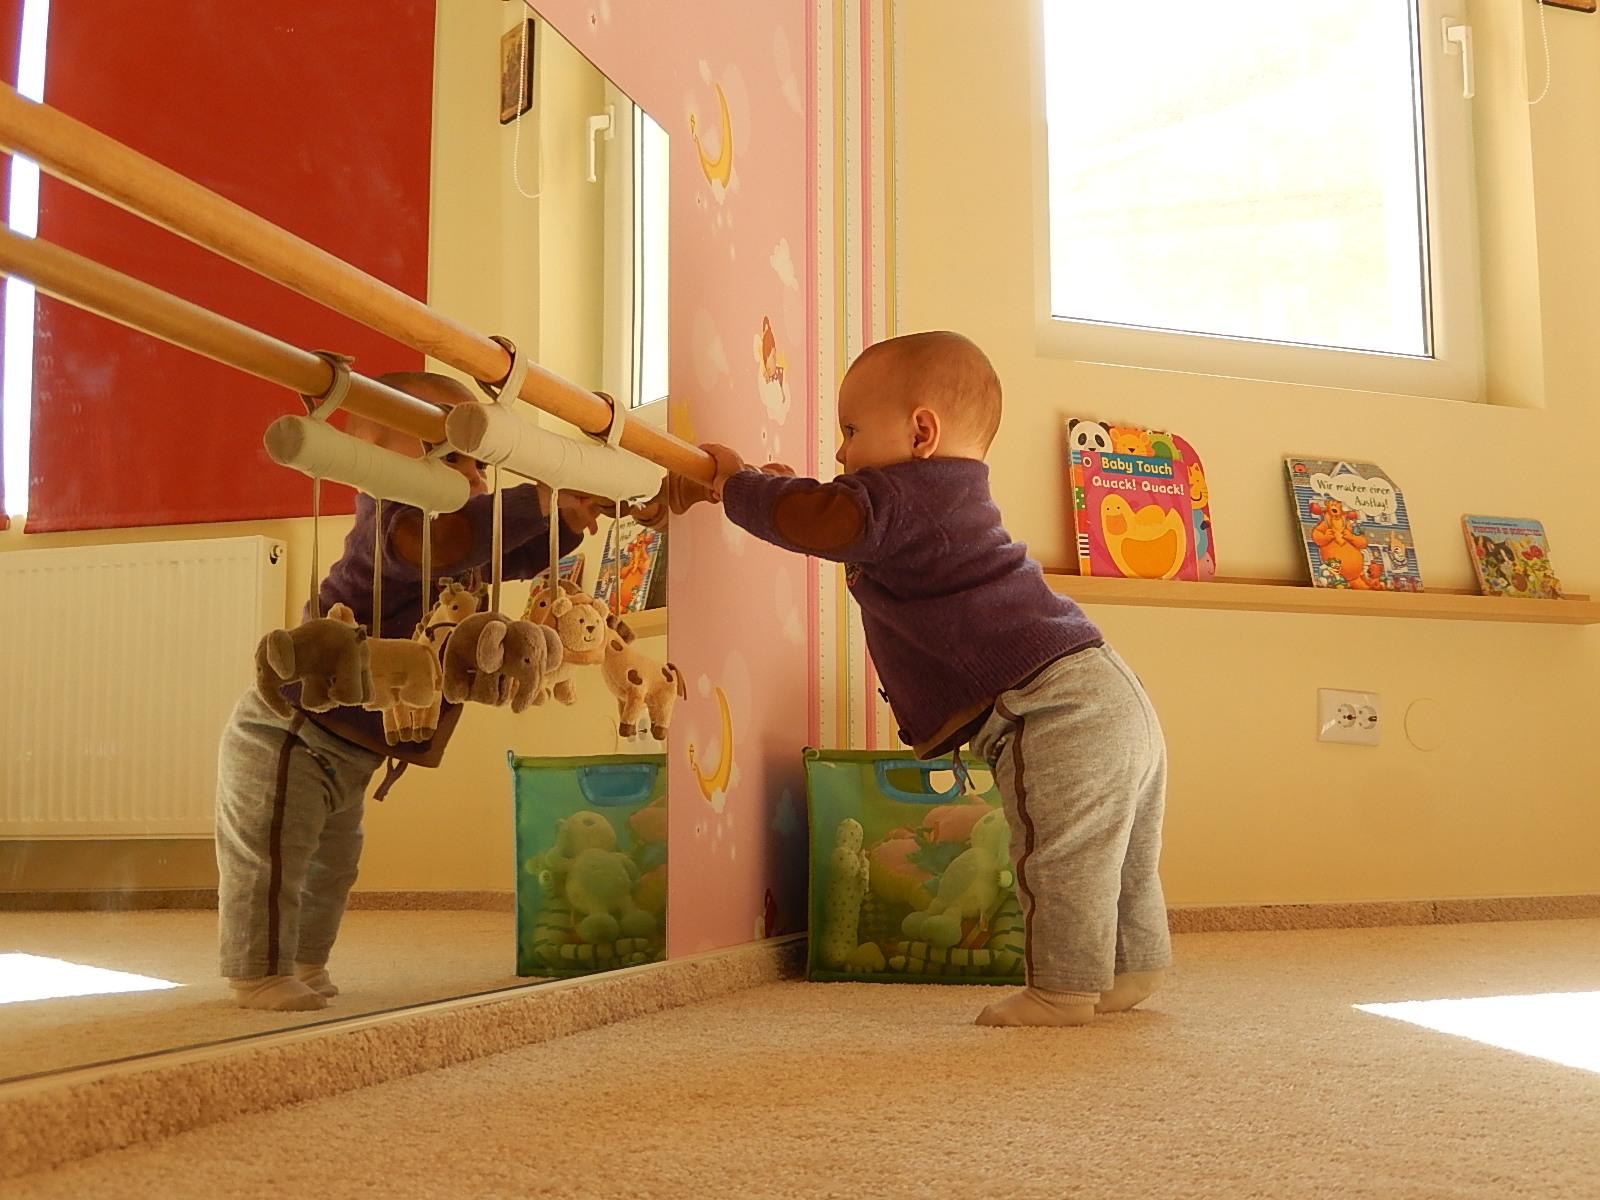 Amenajare Camera Montessori : Despre teoria și practica montessori cu raluca dobre suntpitic